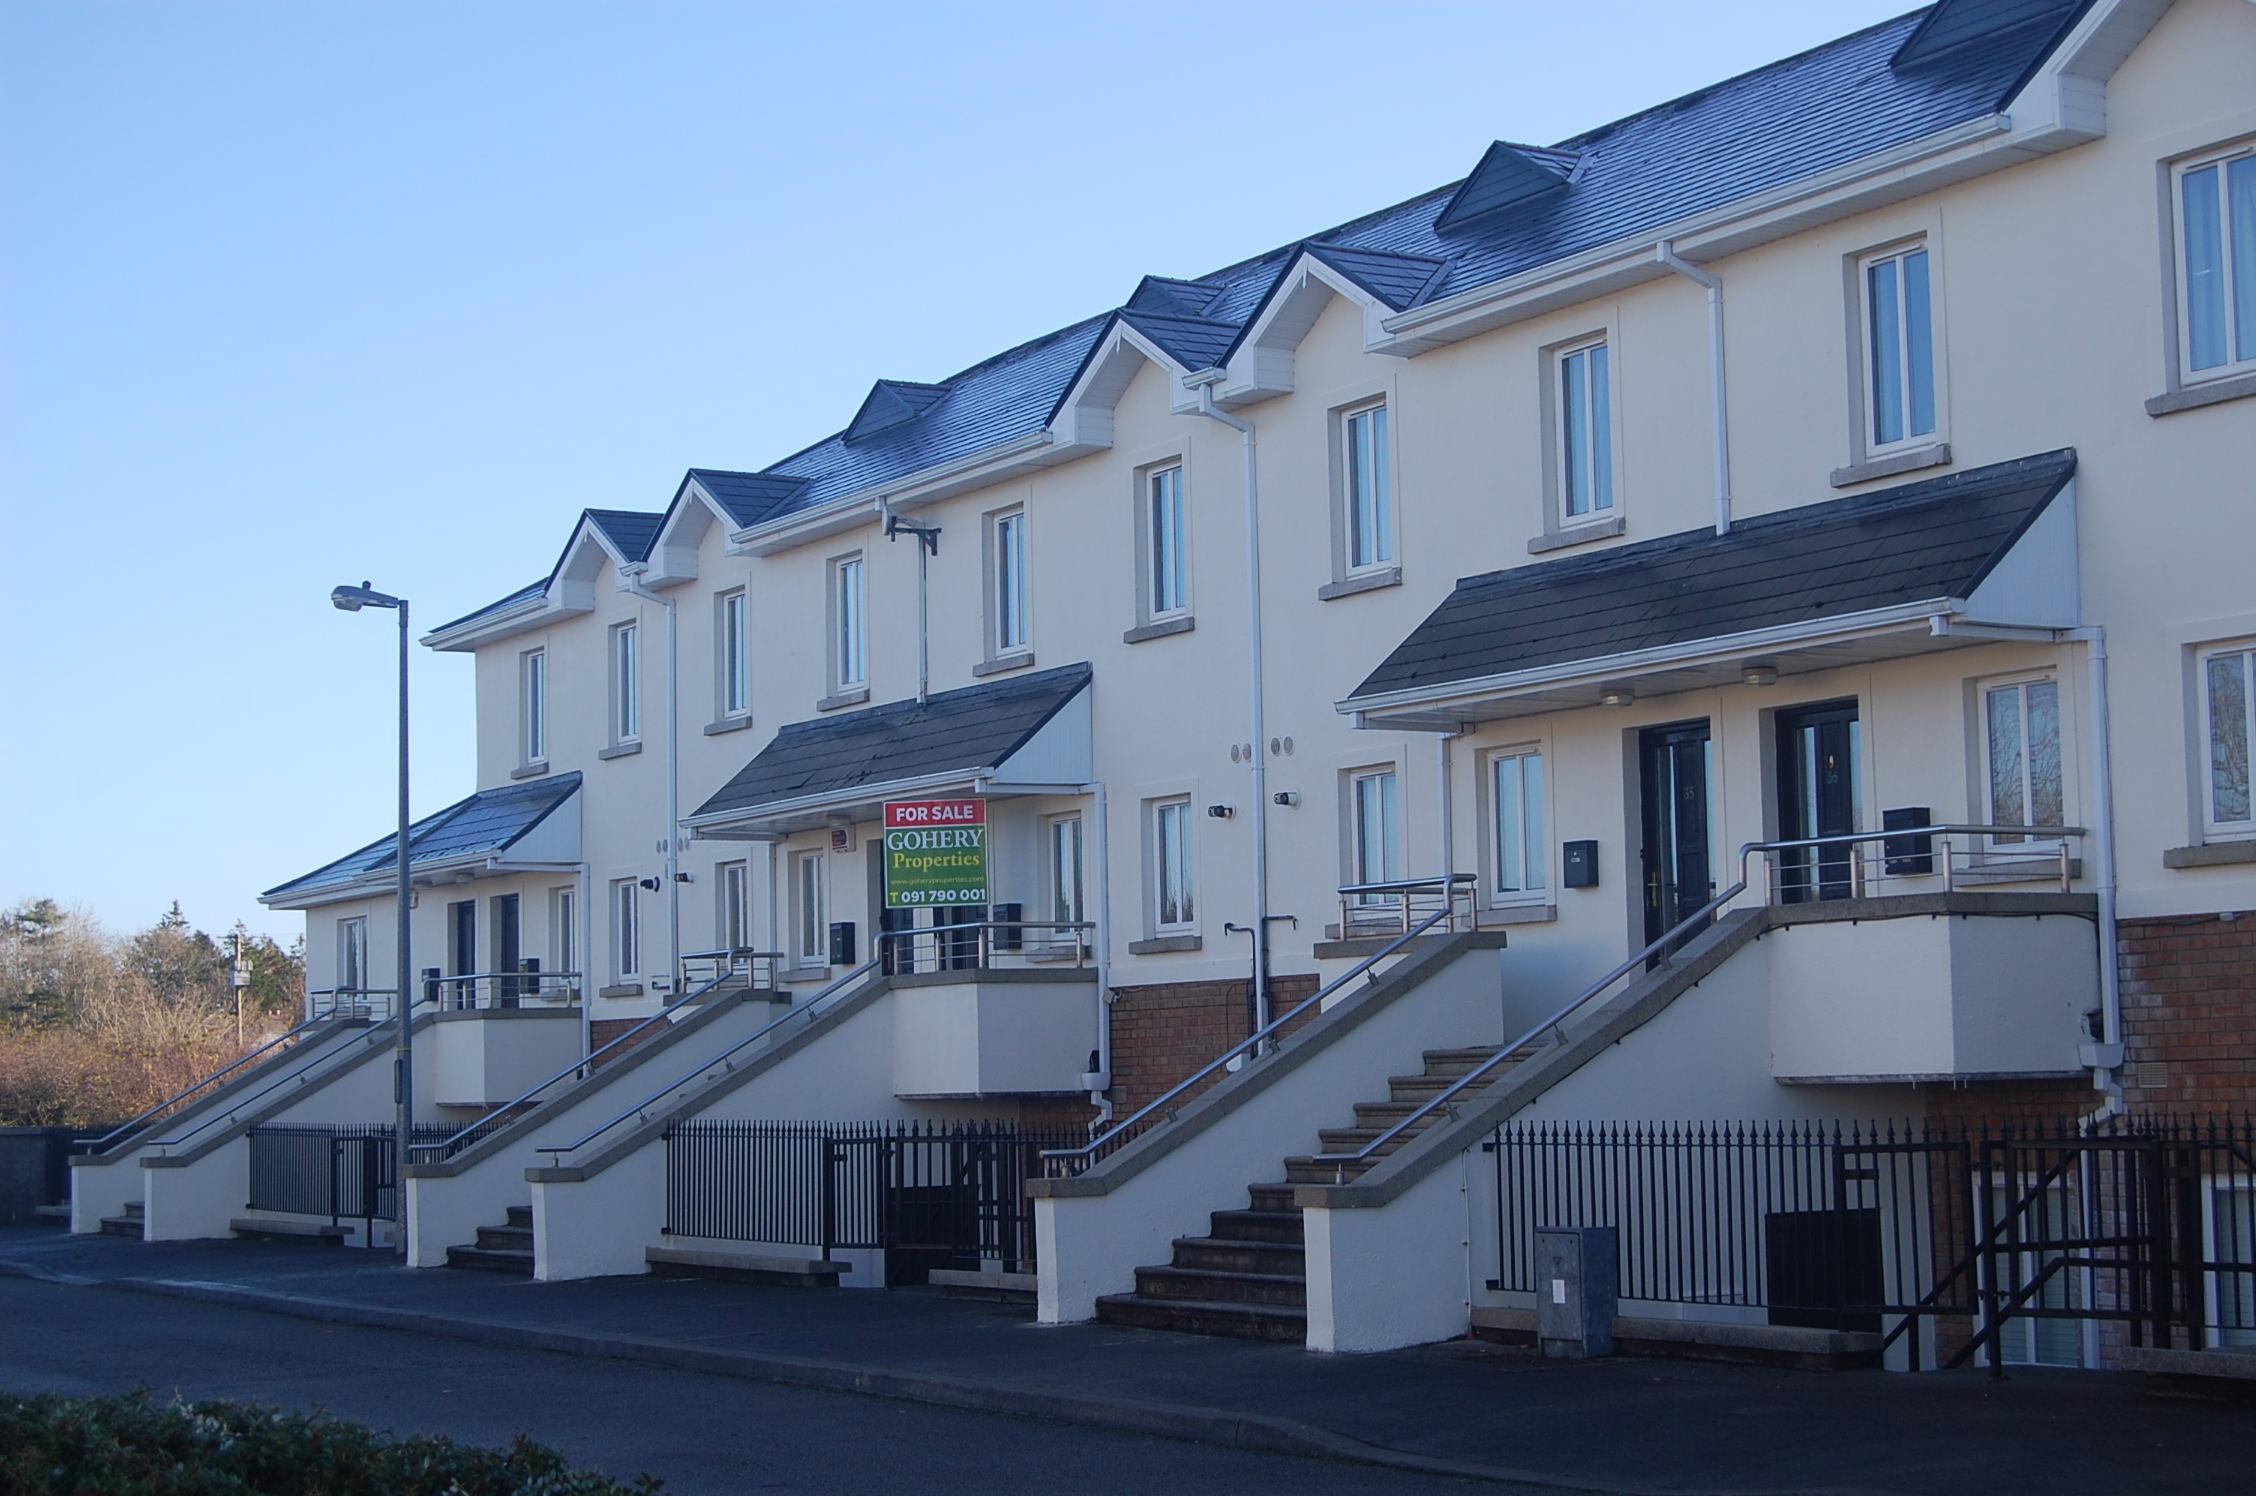 34 Oranbay Apartments, Oranhill Drive, Oranhill, Oranmore, Co. Galway Eircode: H91 TX36